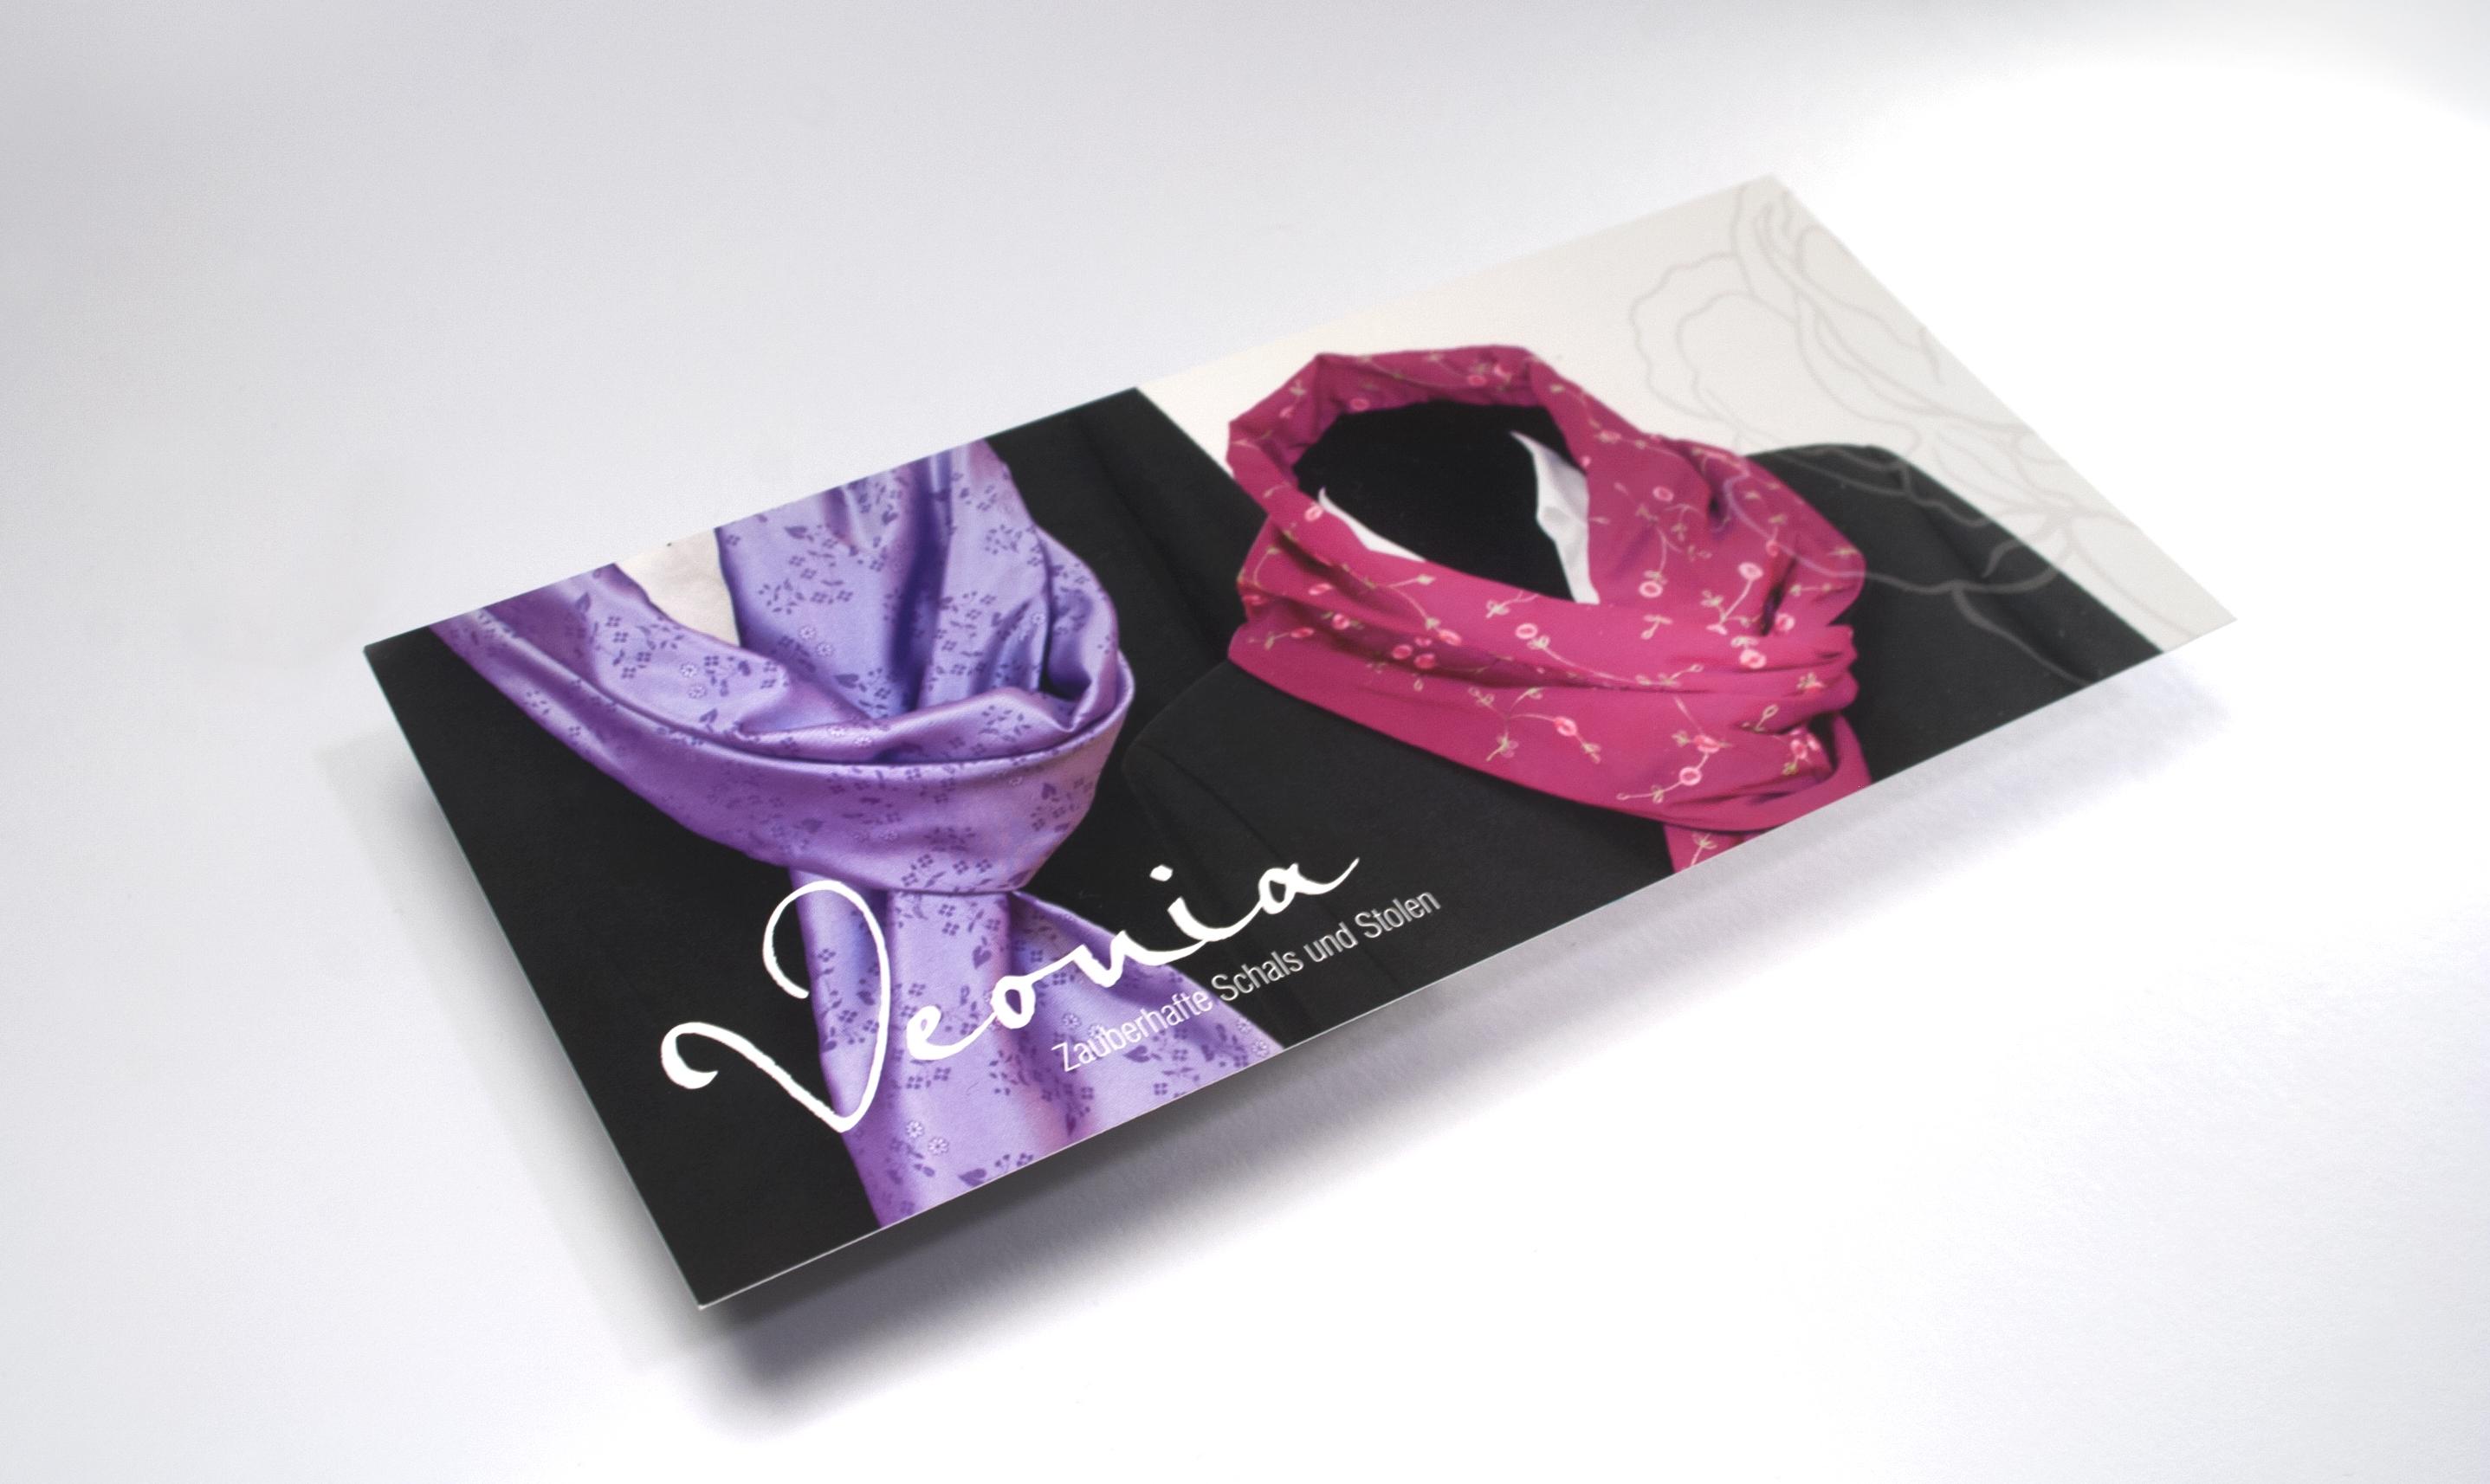 Projekt Veonia